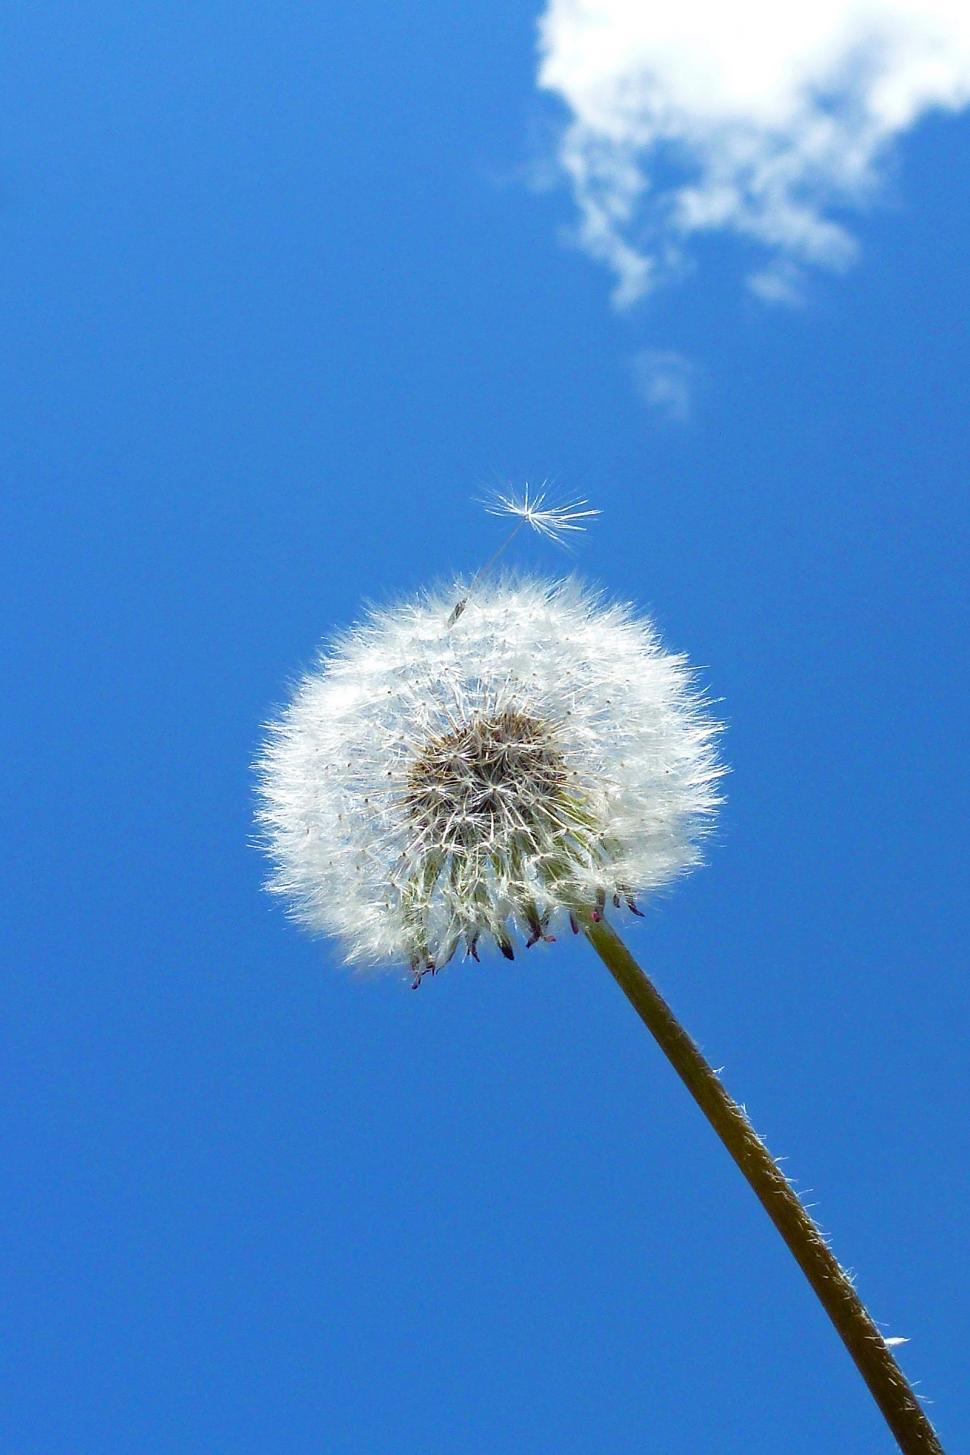 Download Free Stock Photo of Dandelion Seeds Agaist Blue Sky